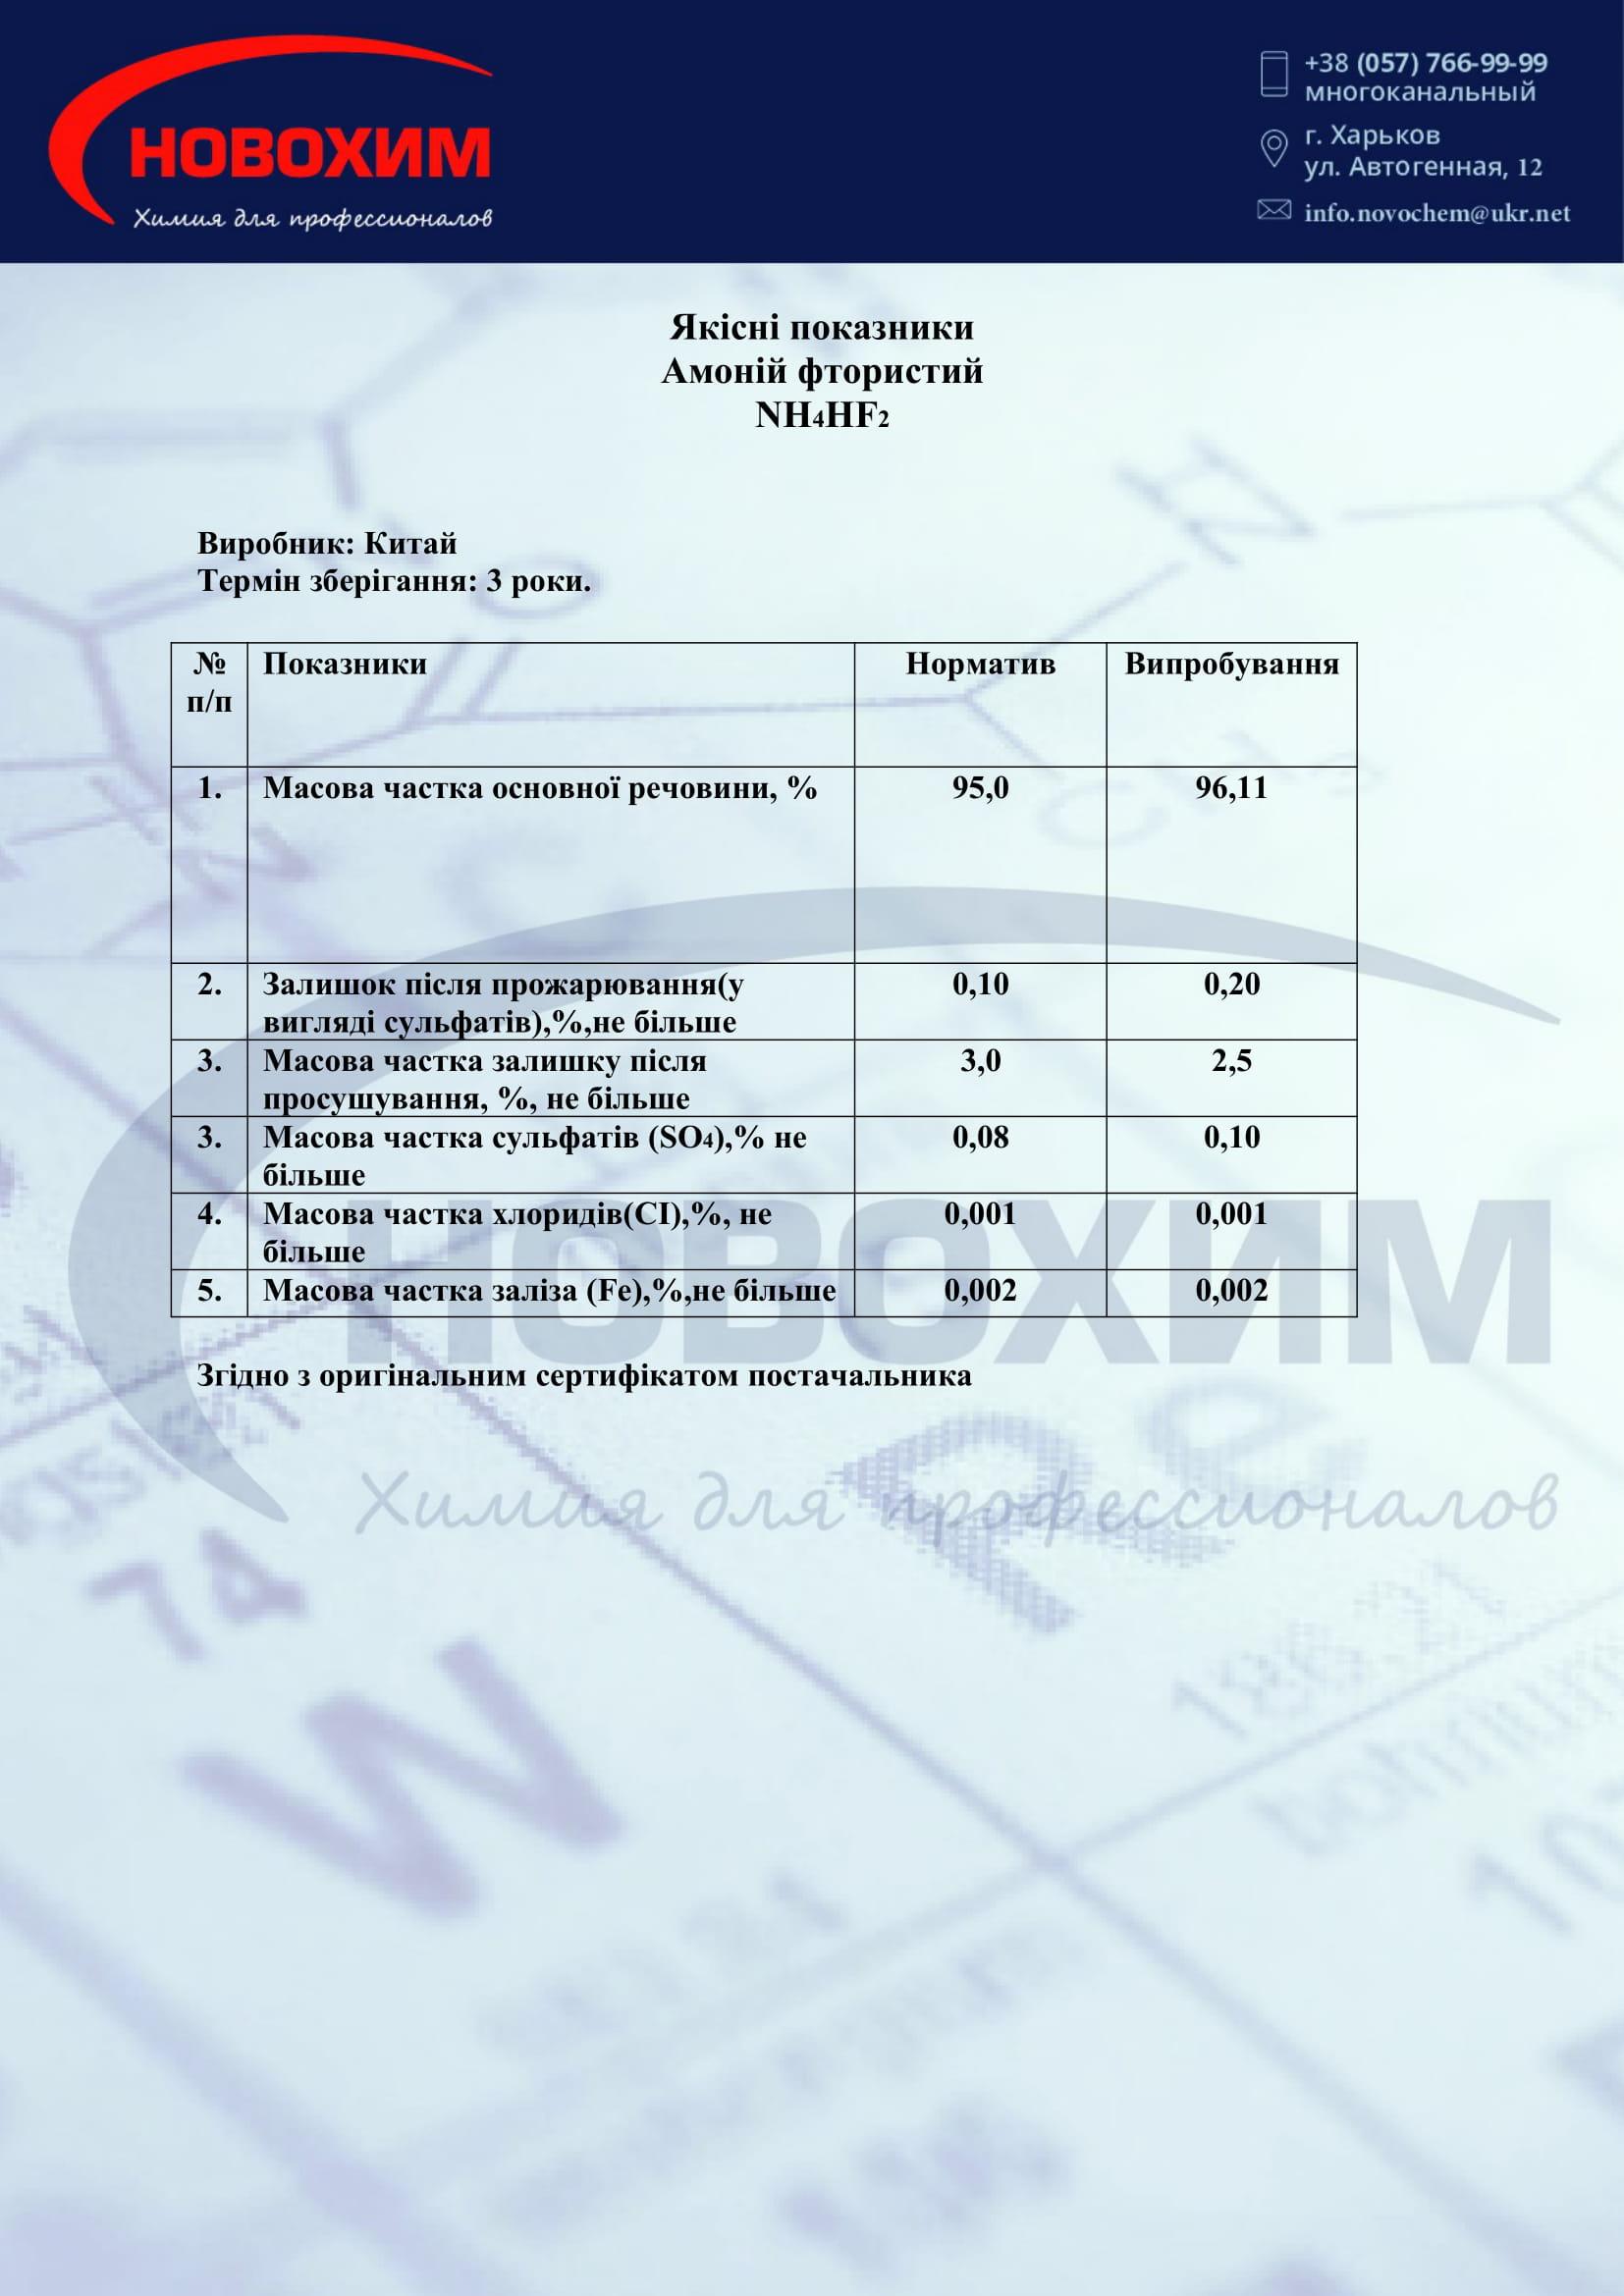 Фото аммоний фтористый сертификат